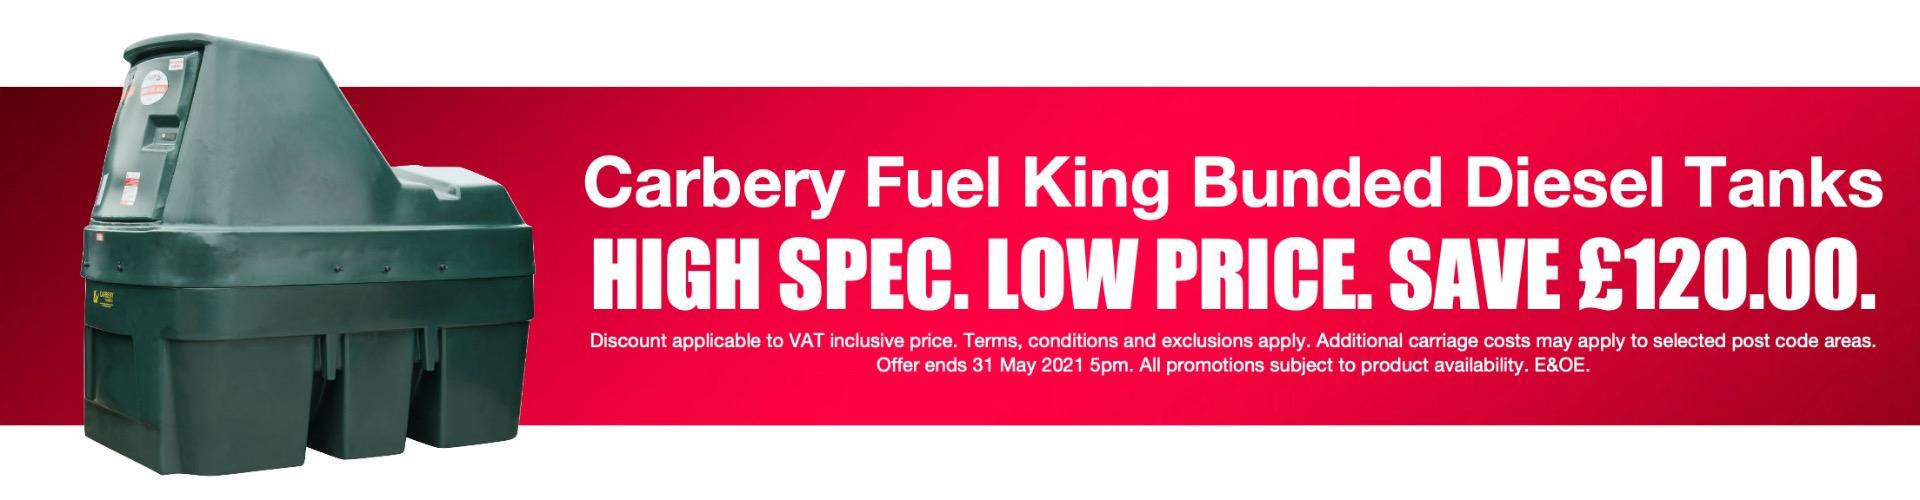 Carbery Fuel King Bunded Diesel Tank Spring 2021 Promotion